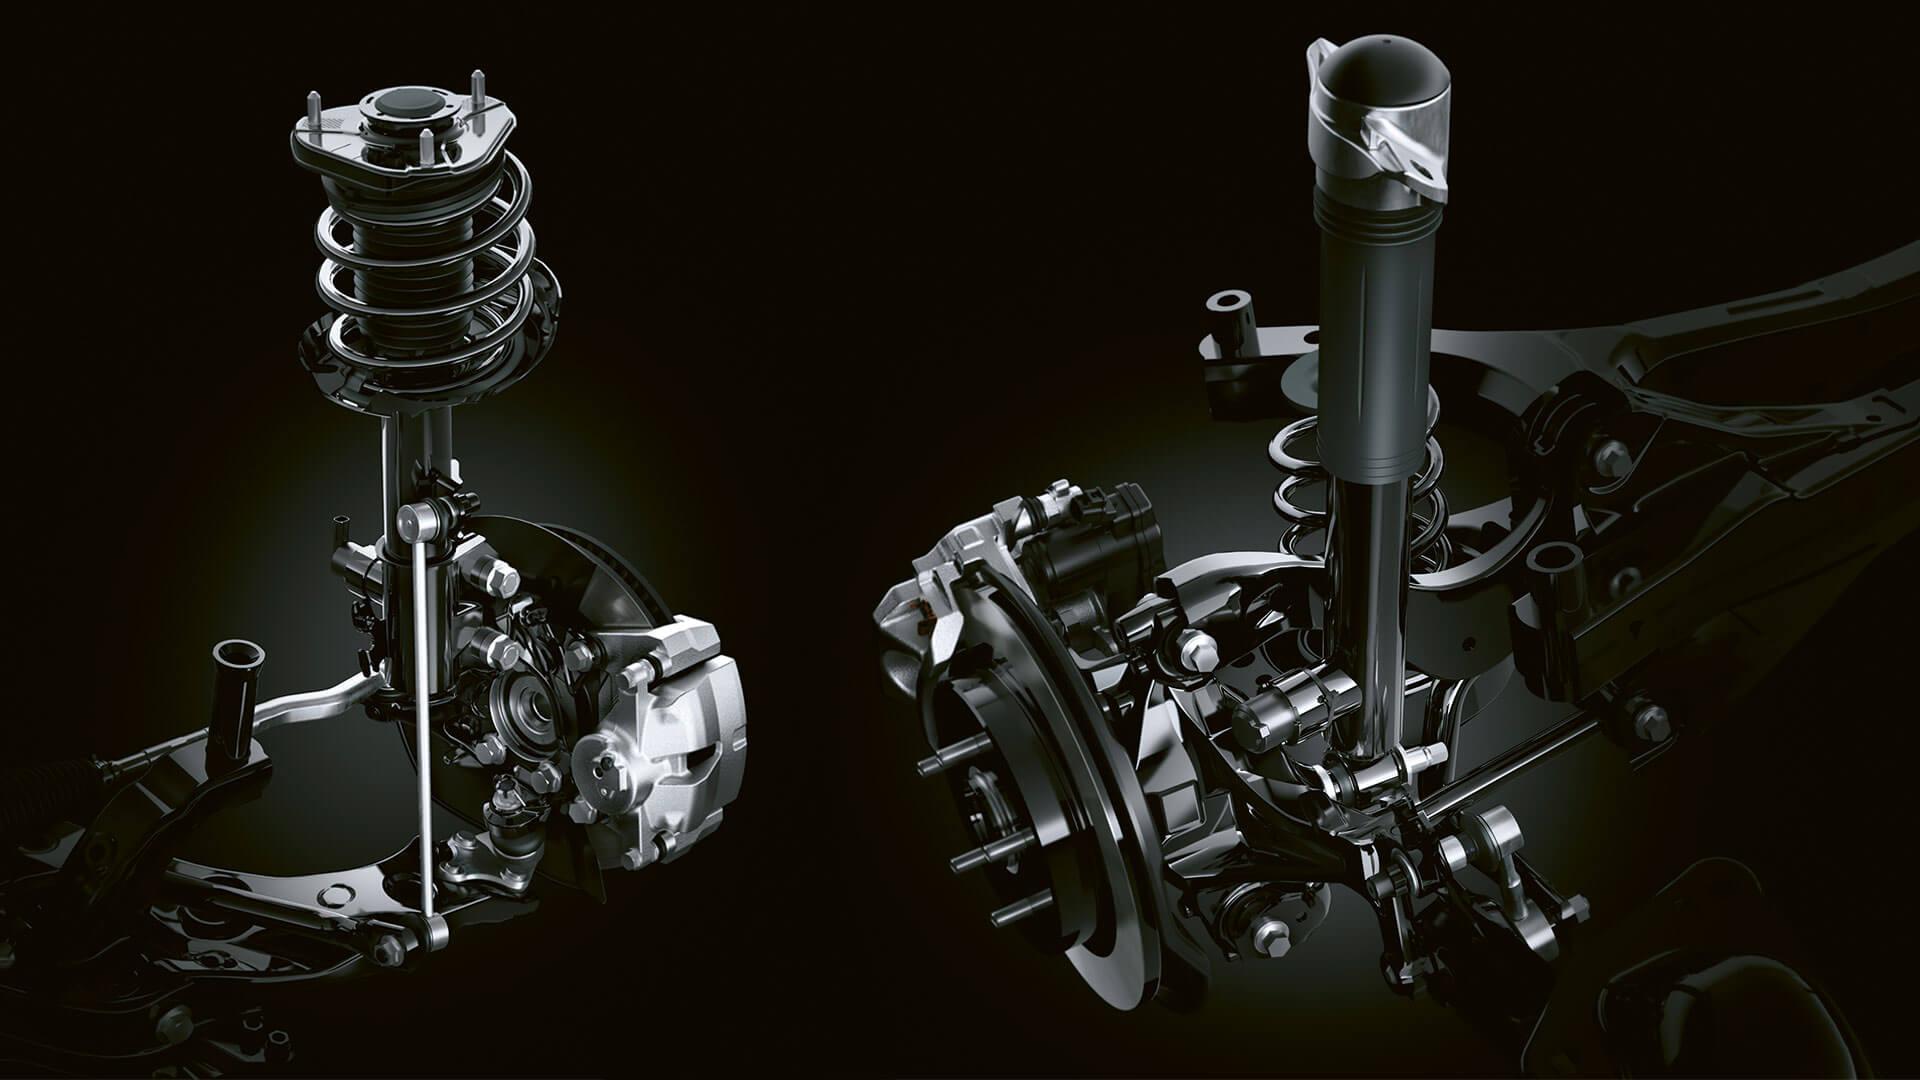 2018 lexus ux hotspot adaptive variable suspension 1920x1080 v2